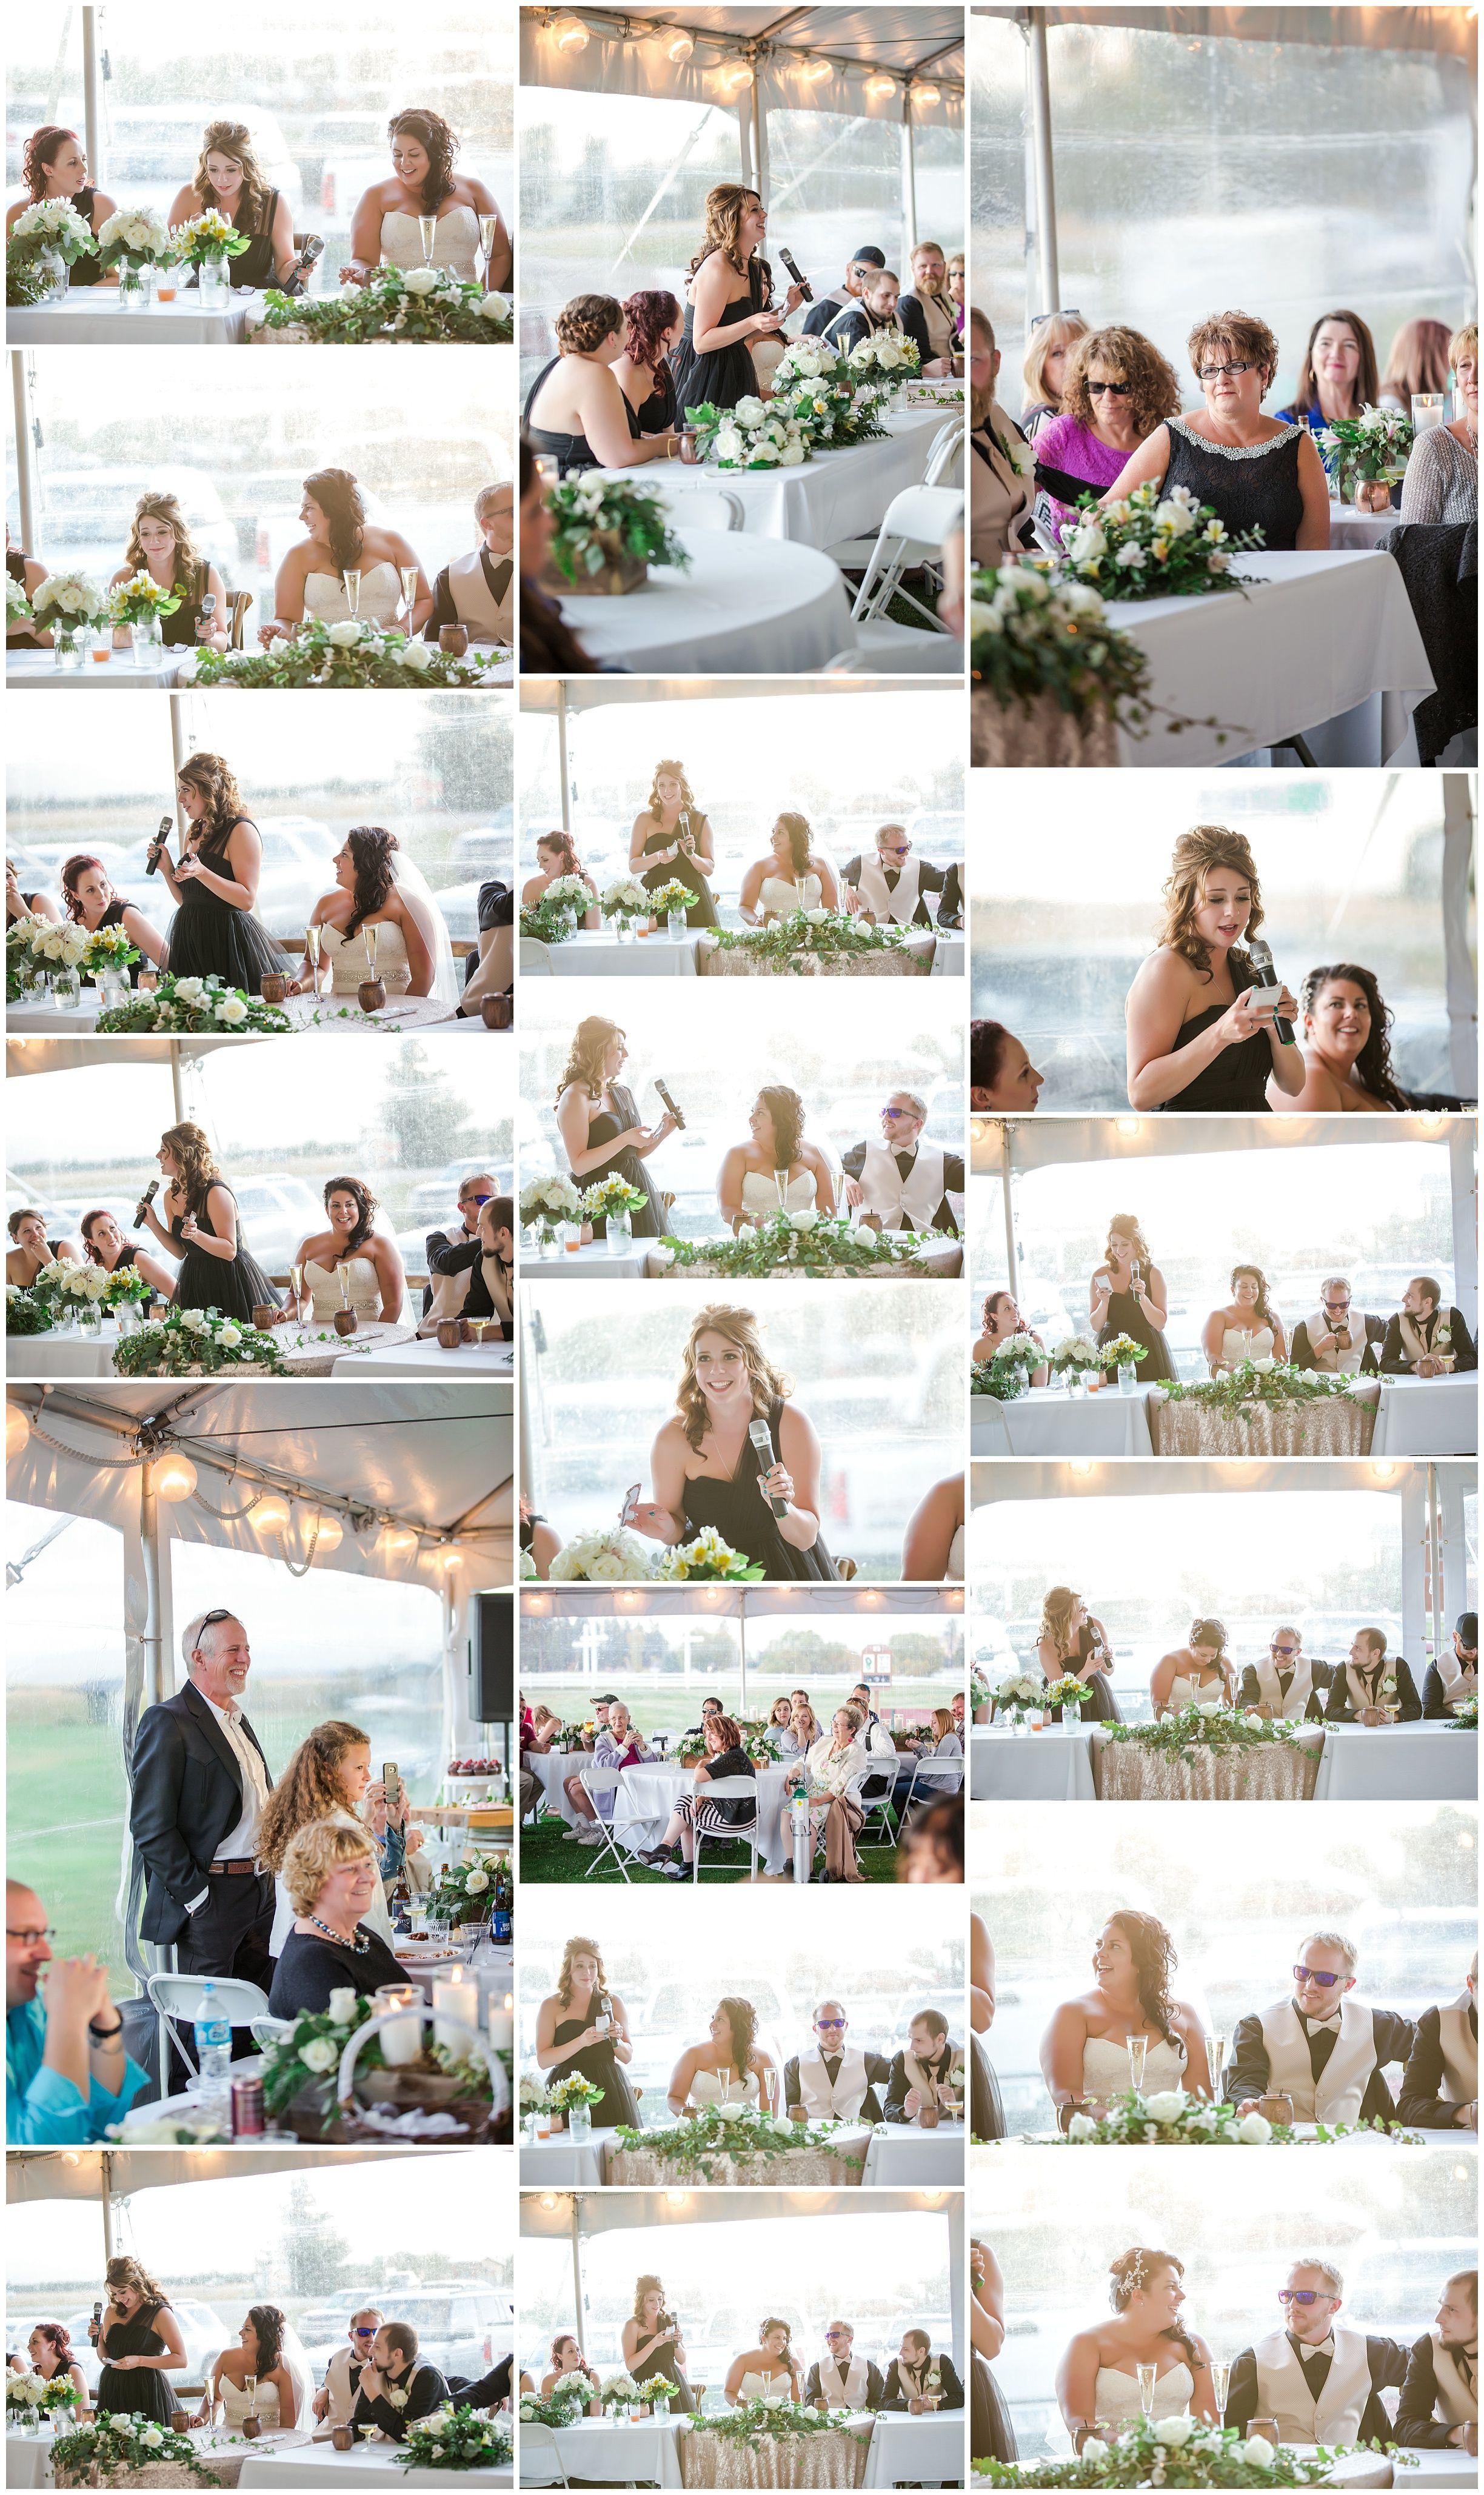 Candace & Jeffery  | Married |  #barndooreventrentals #KalispellWeddingPhotographer #KiraleeJonesPhotographer #montanaartspot #MontanaWeddingPhotographer #whiskeytangokalispellweddings www.kiraleejonesphotographer.com